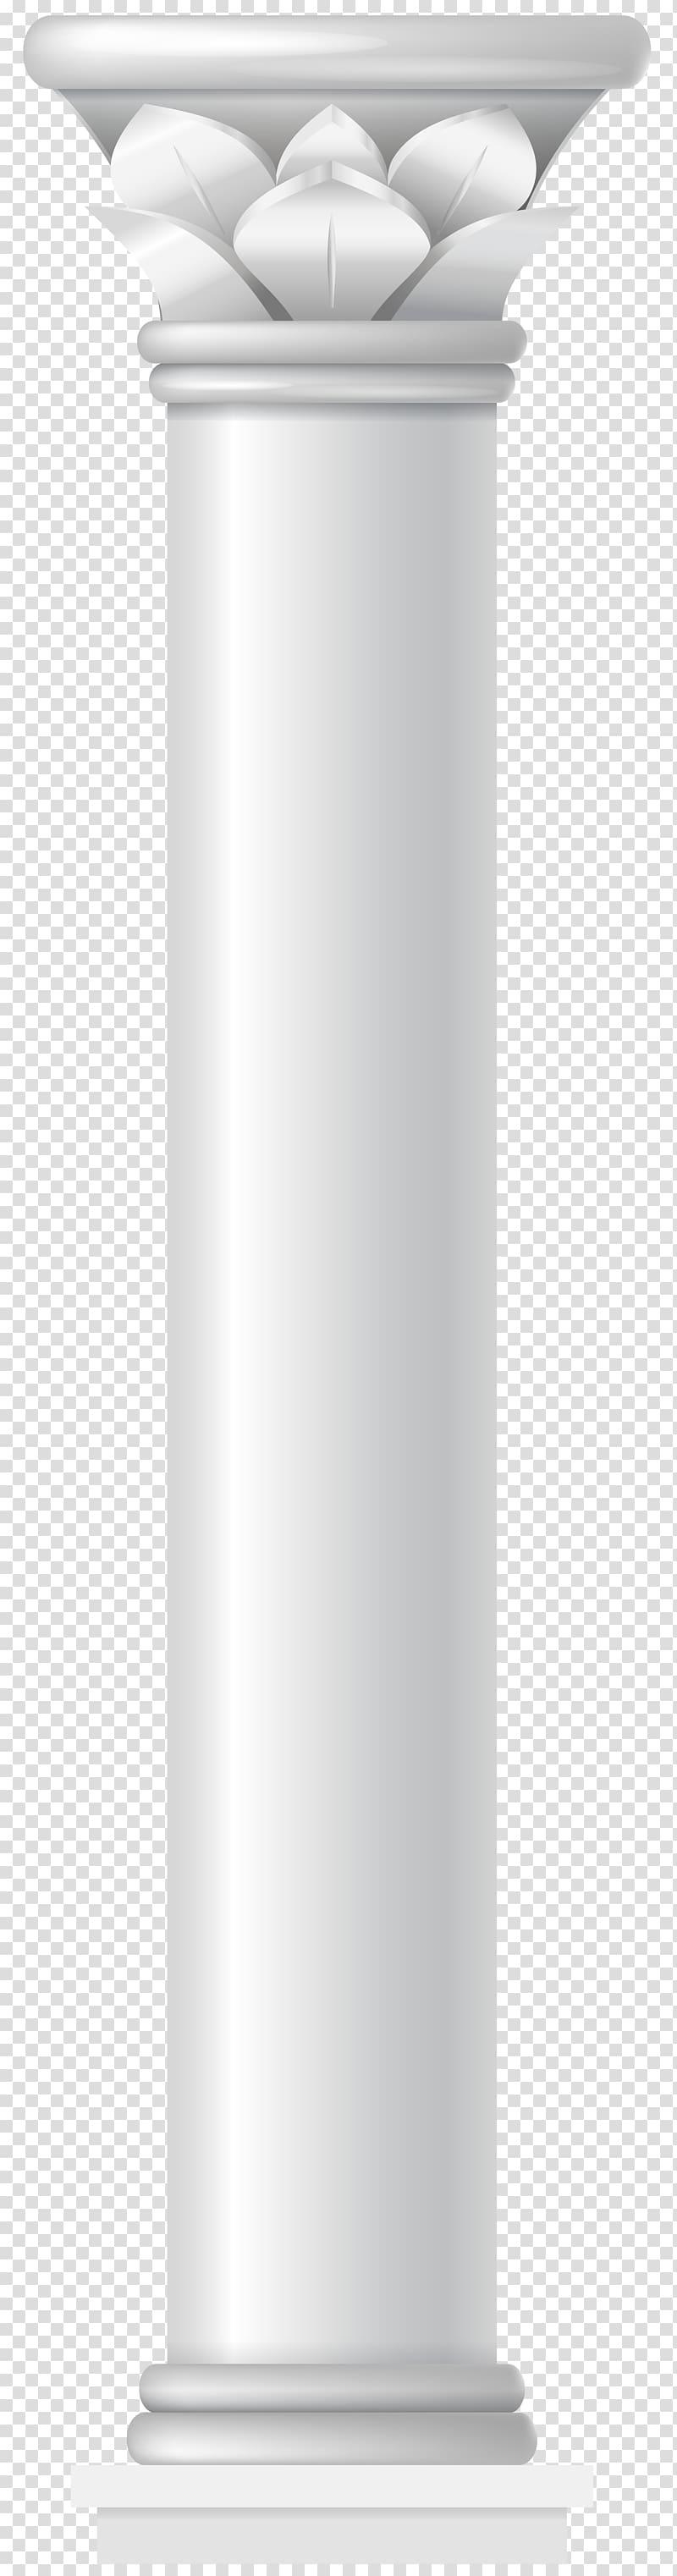 White pillar digital illustration, Angle Cylinder, Pillar.